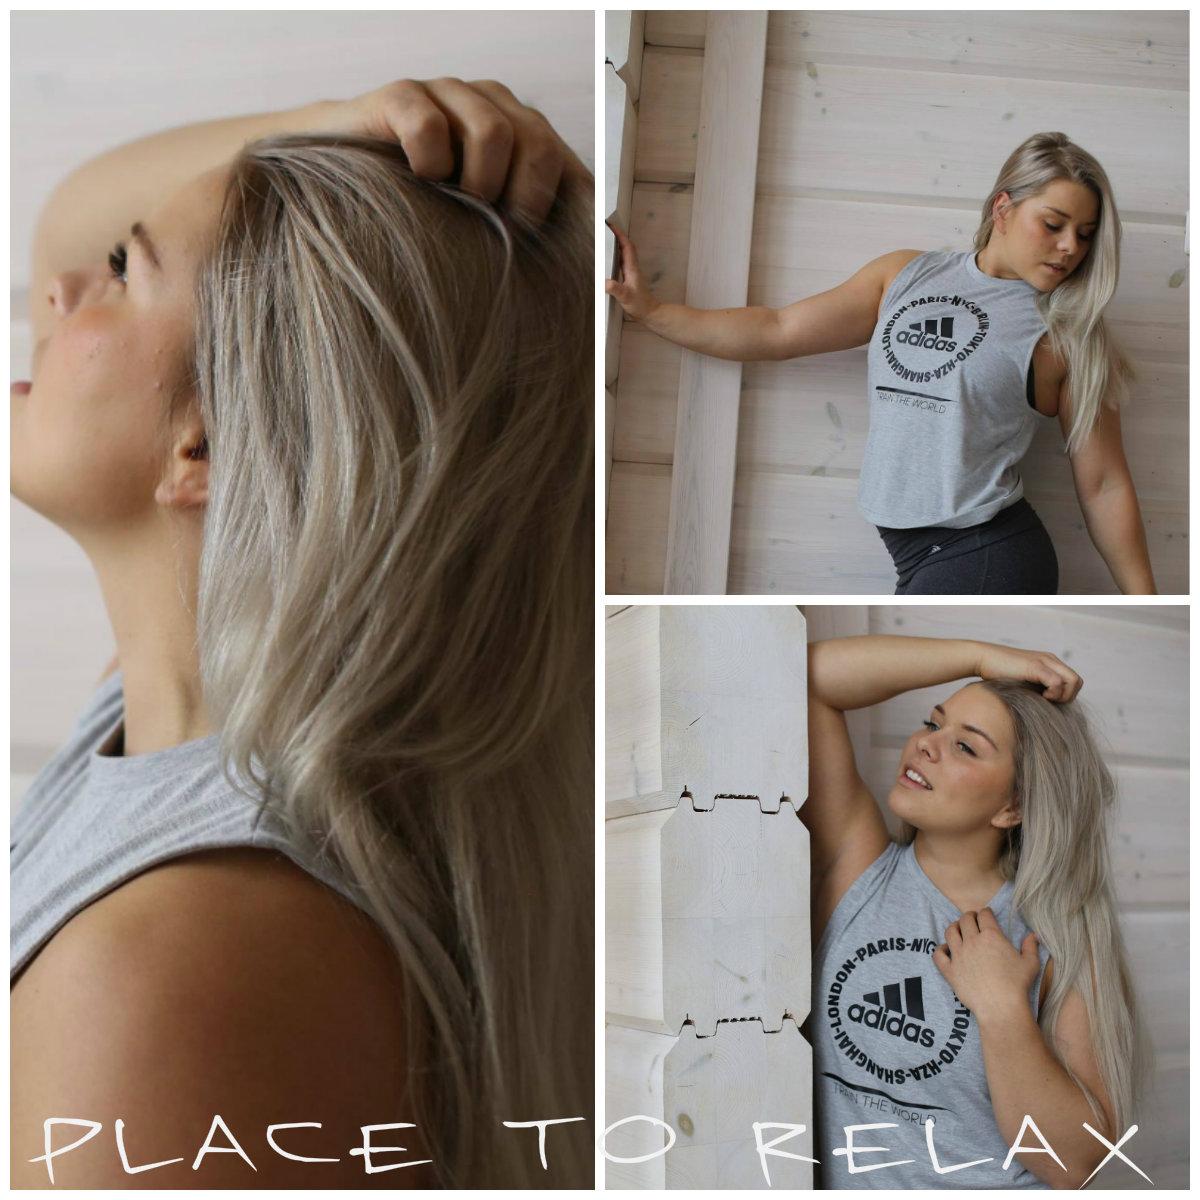 placetorelax_eevsku